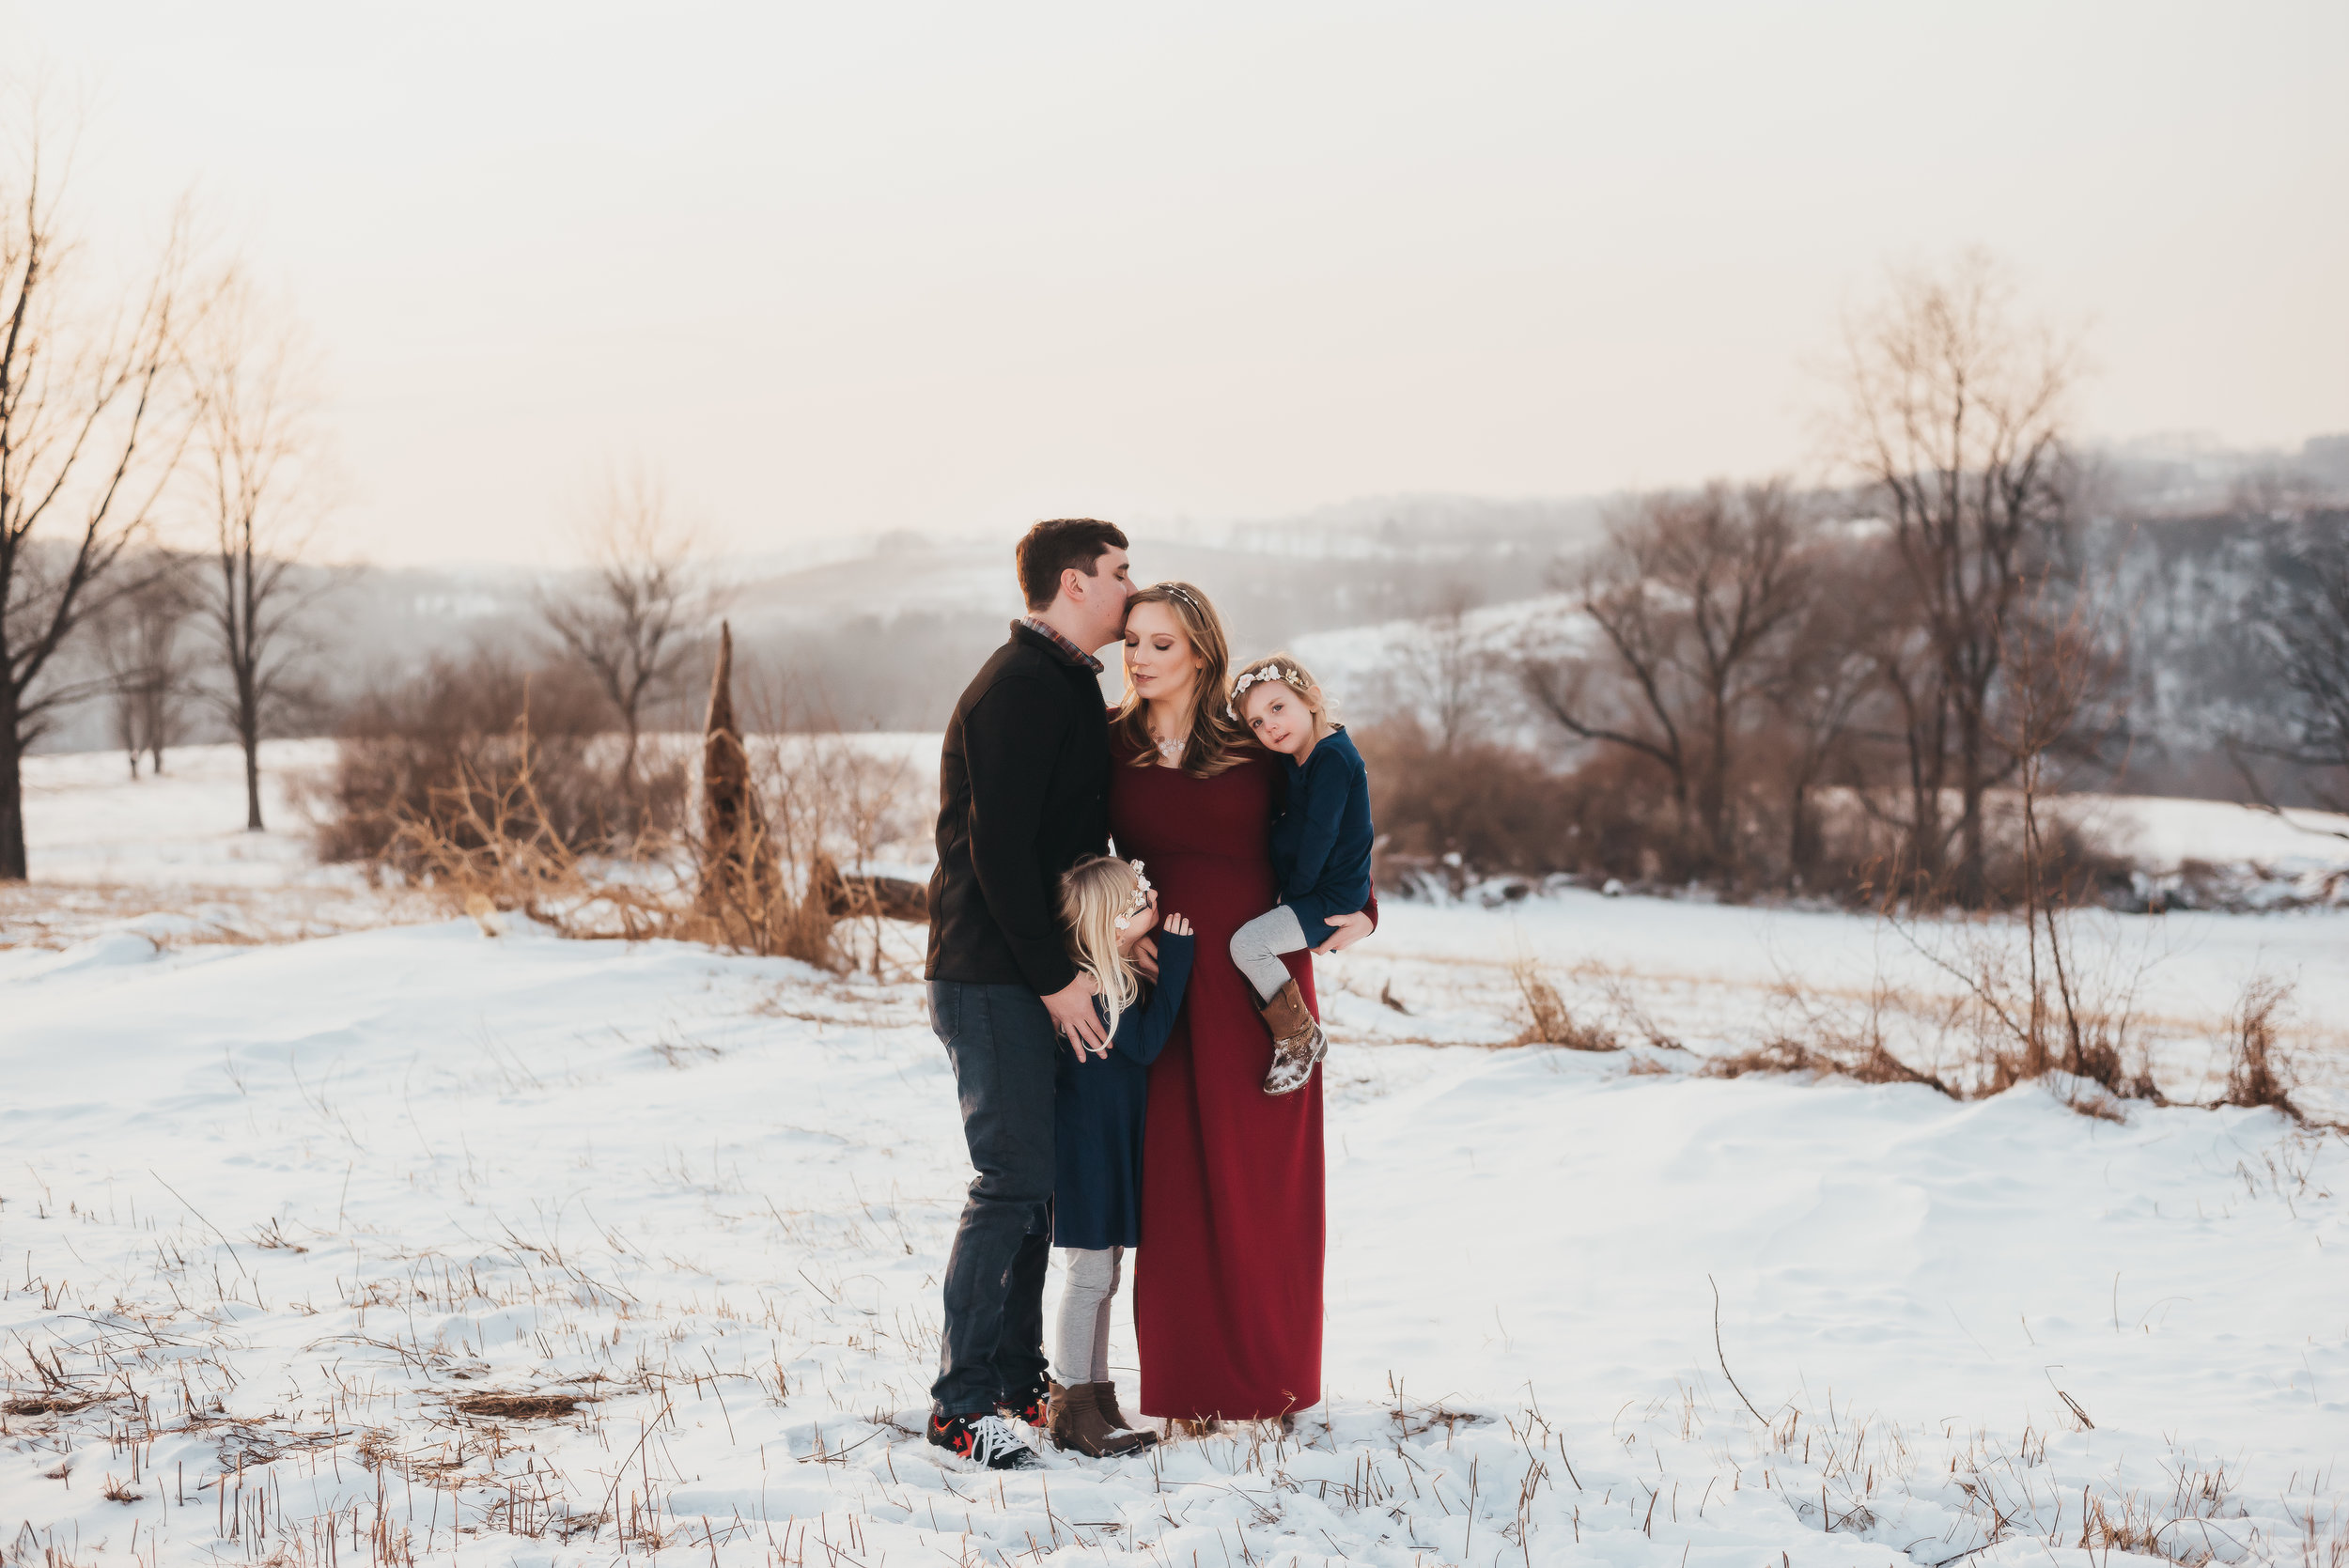 Colorado Maternity Photographer Ashley Hobel Photography